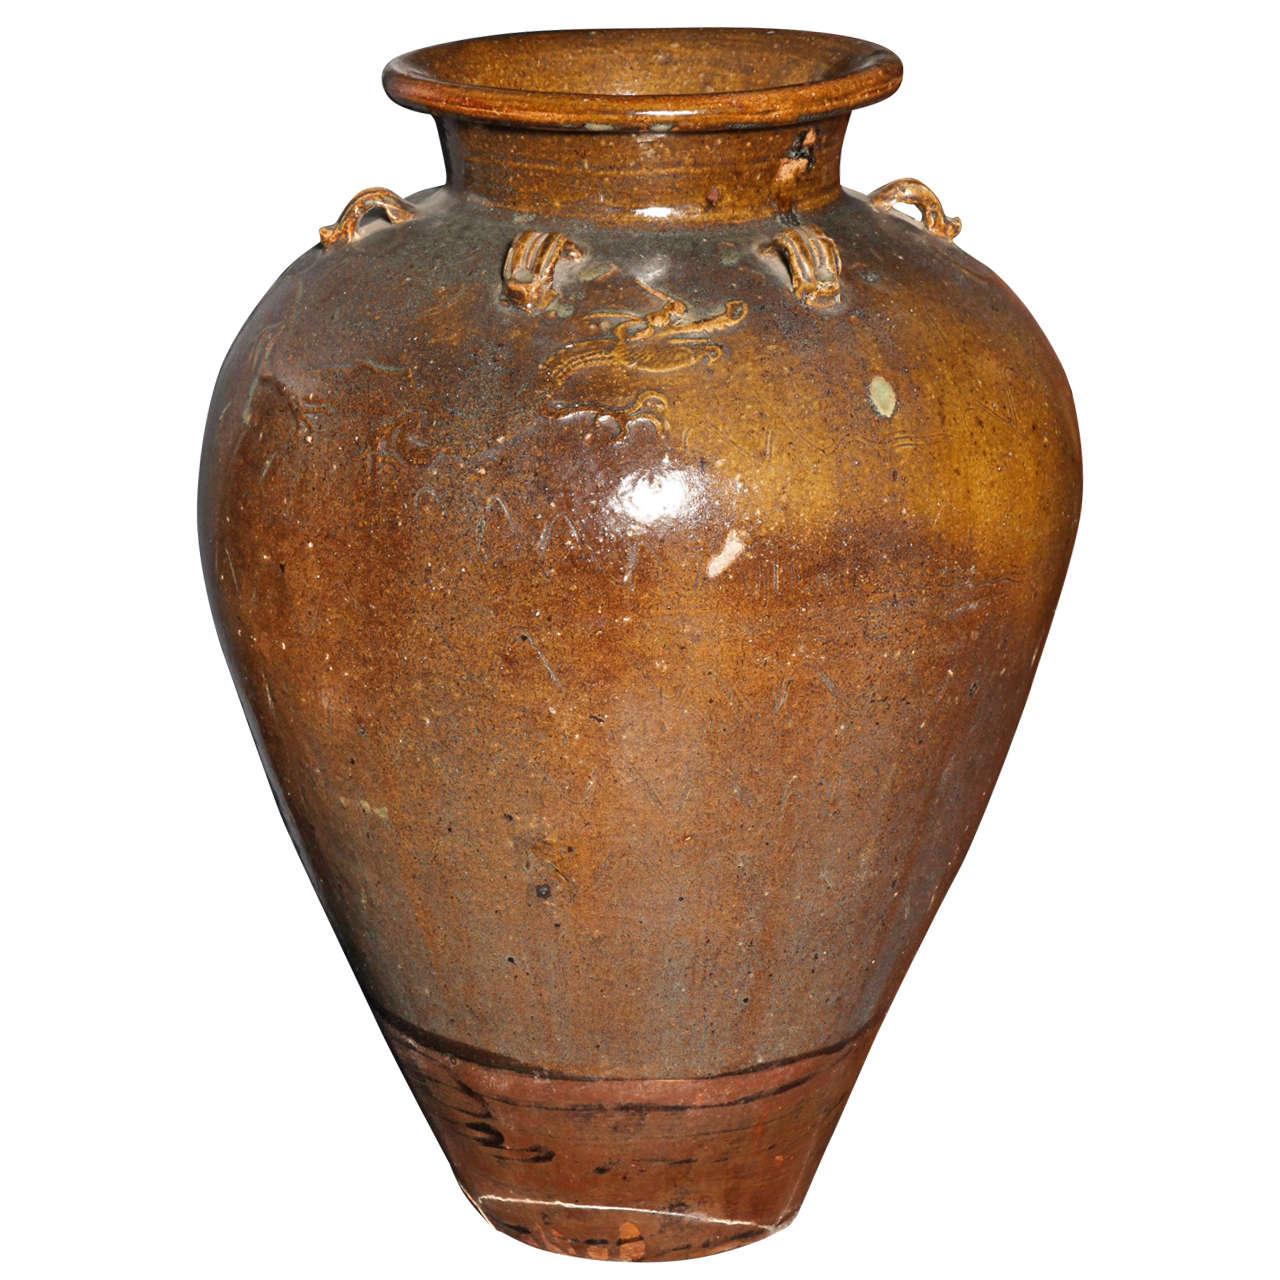 Yuan Dynasty Martaban Jar with Ochre Glaze from China, 12th-13th Century